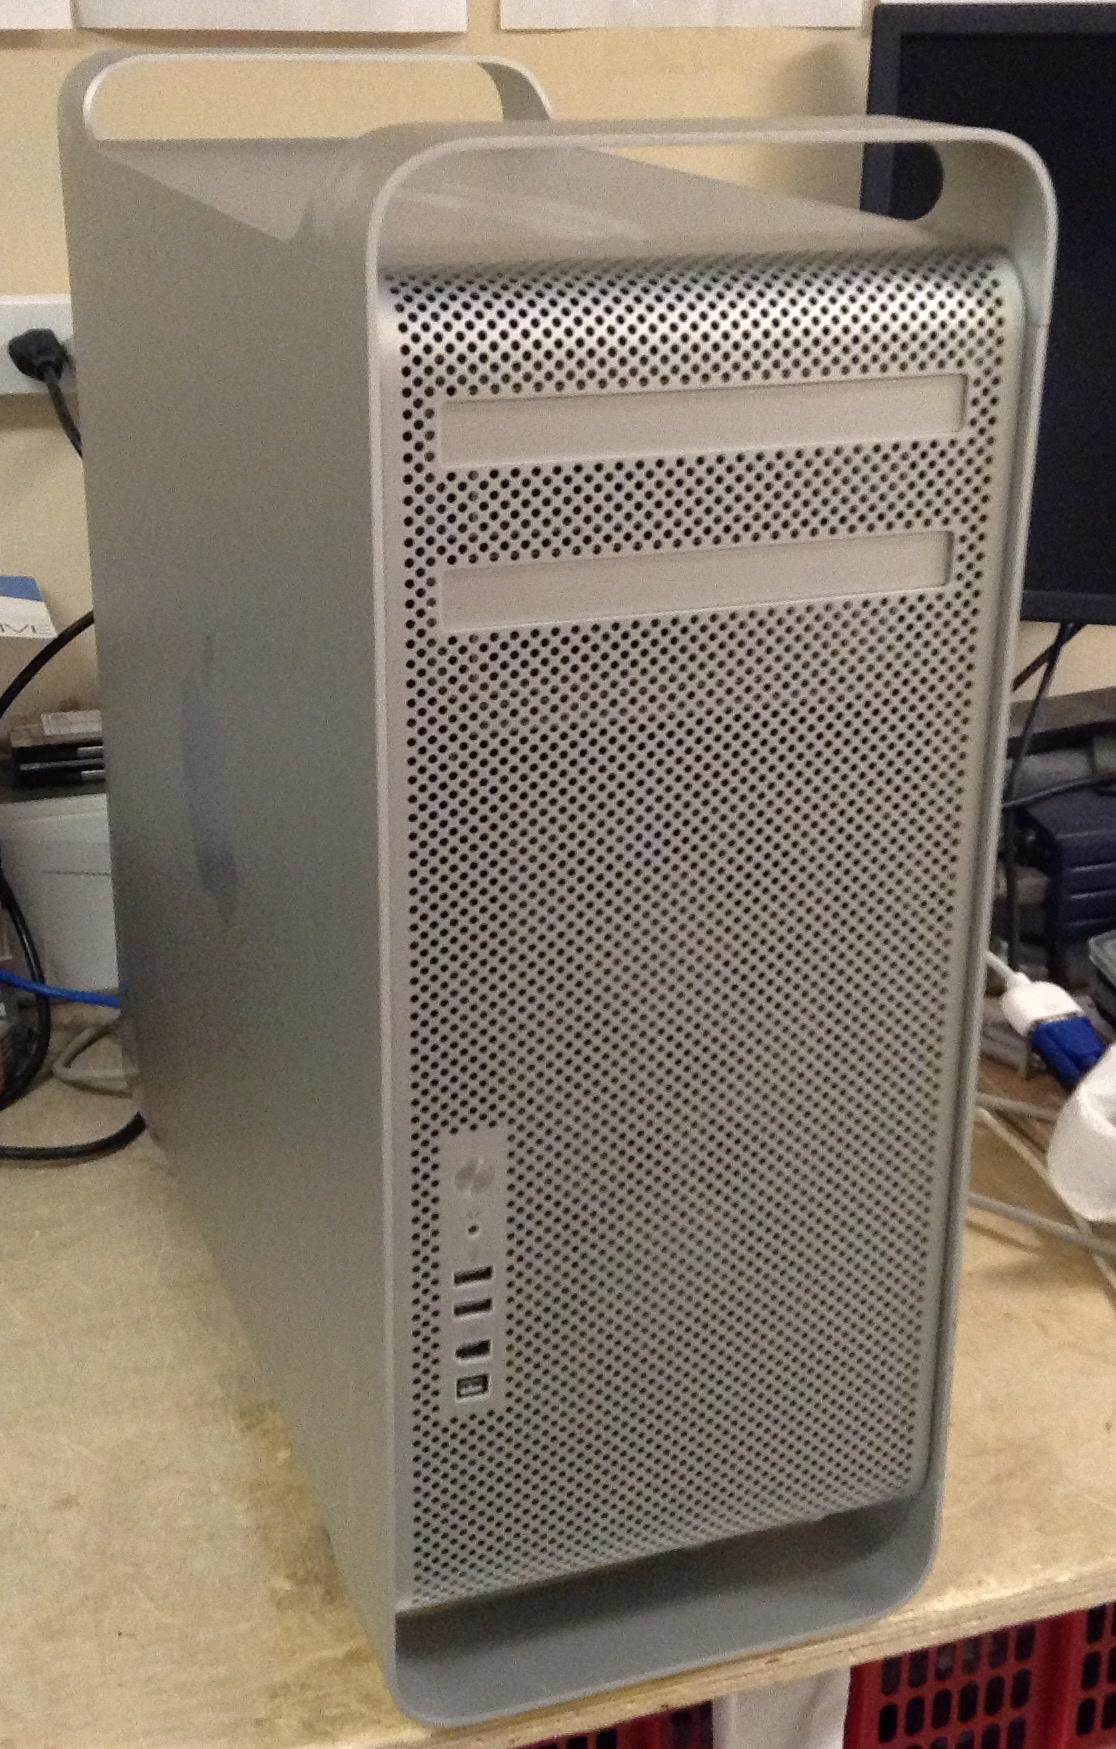 Apple Mac Pro Dual 2 8ghz Quad Core Intel Xeon Ma970ll A